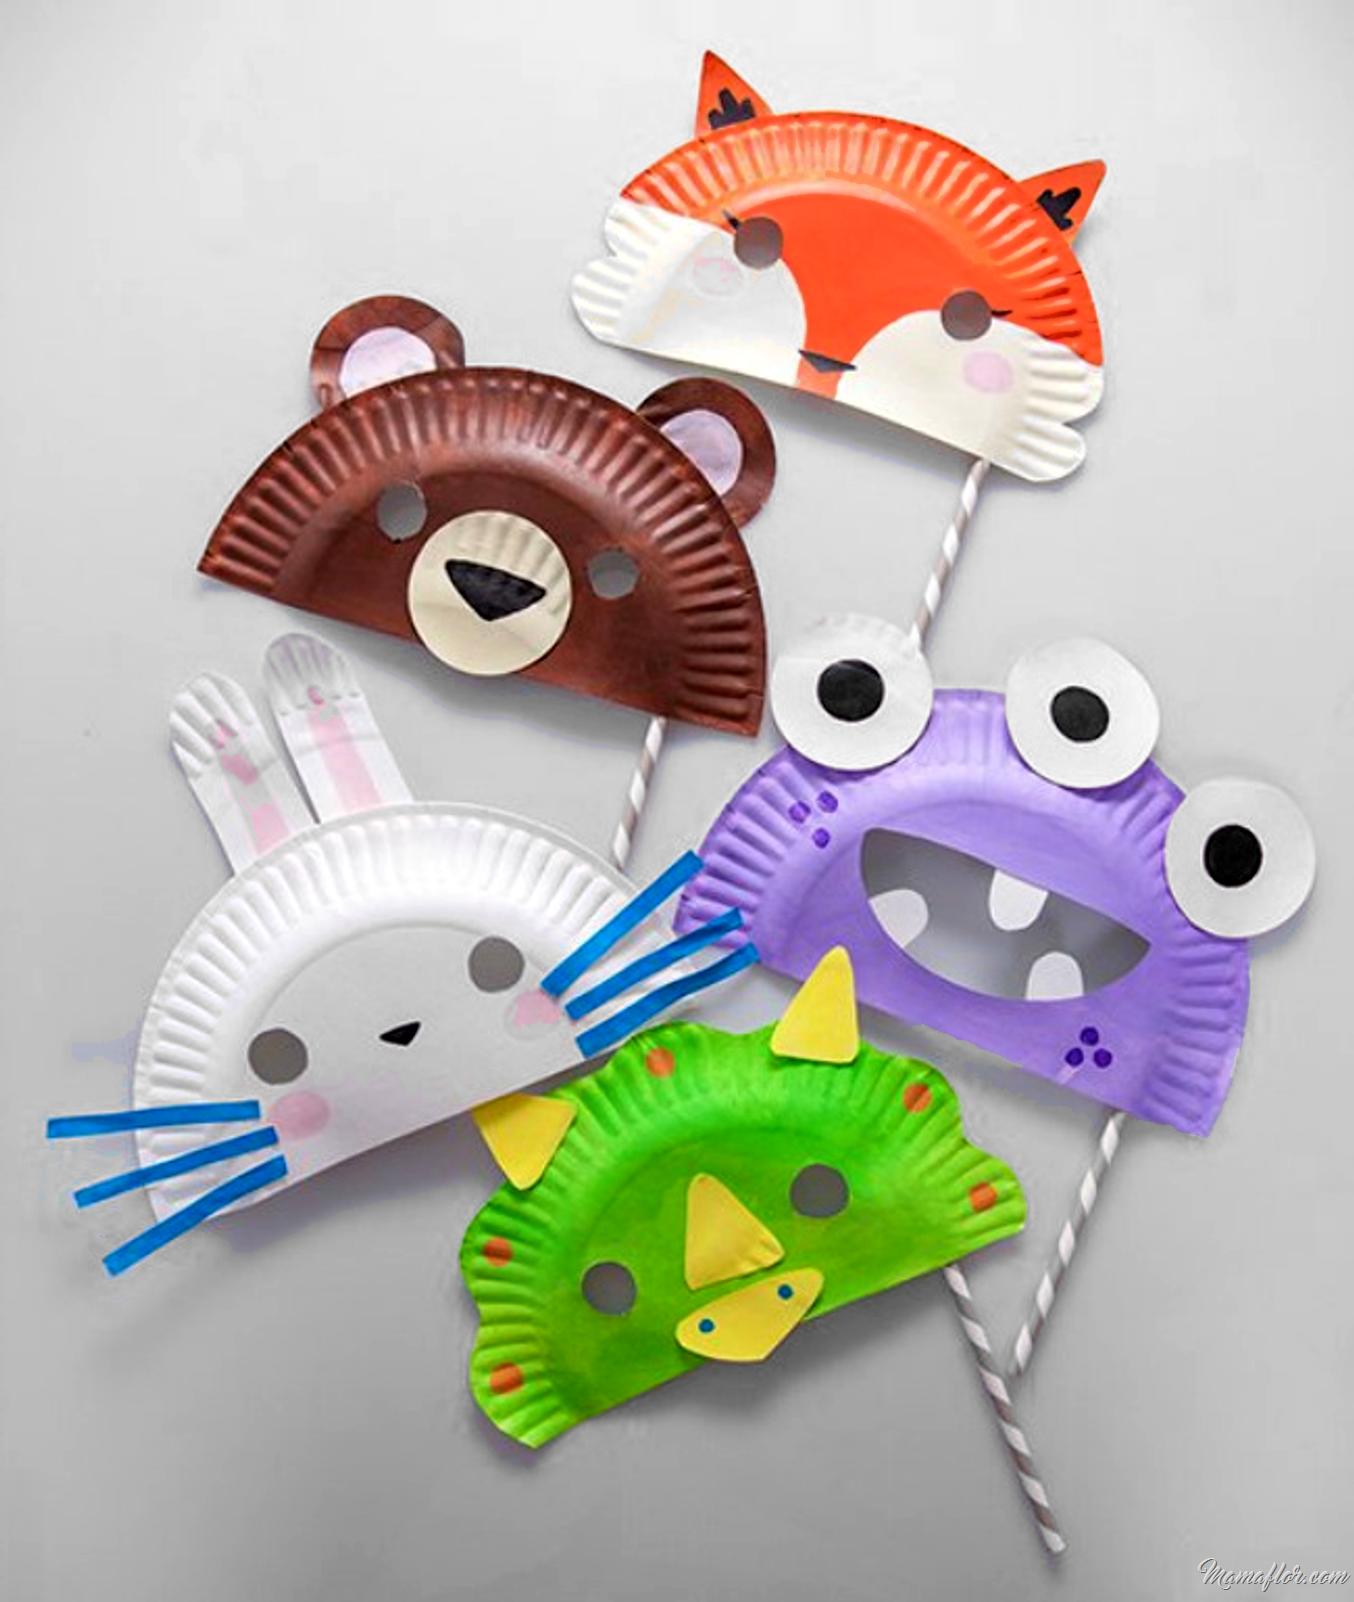 30 ideas para decorar con platos desechables - Manualidades de decoracion ...